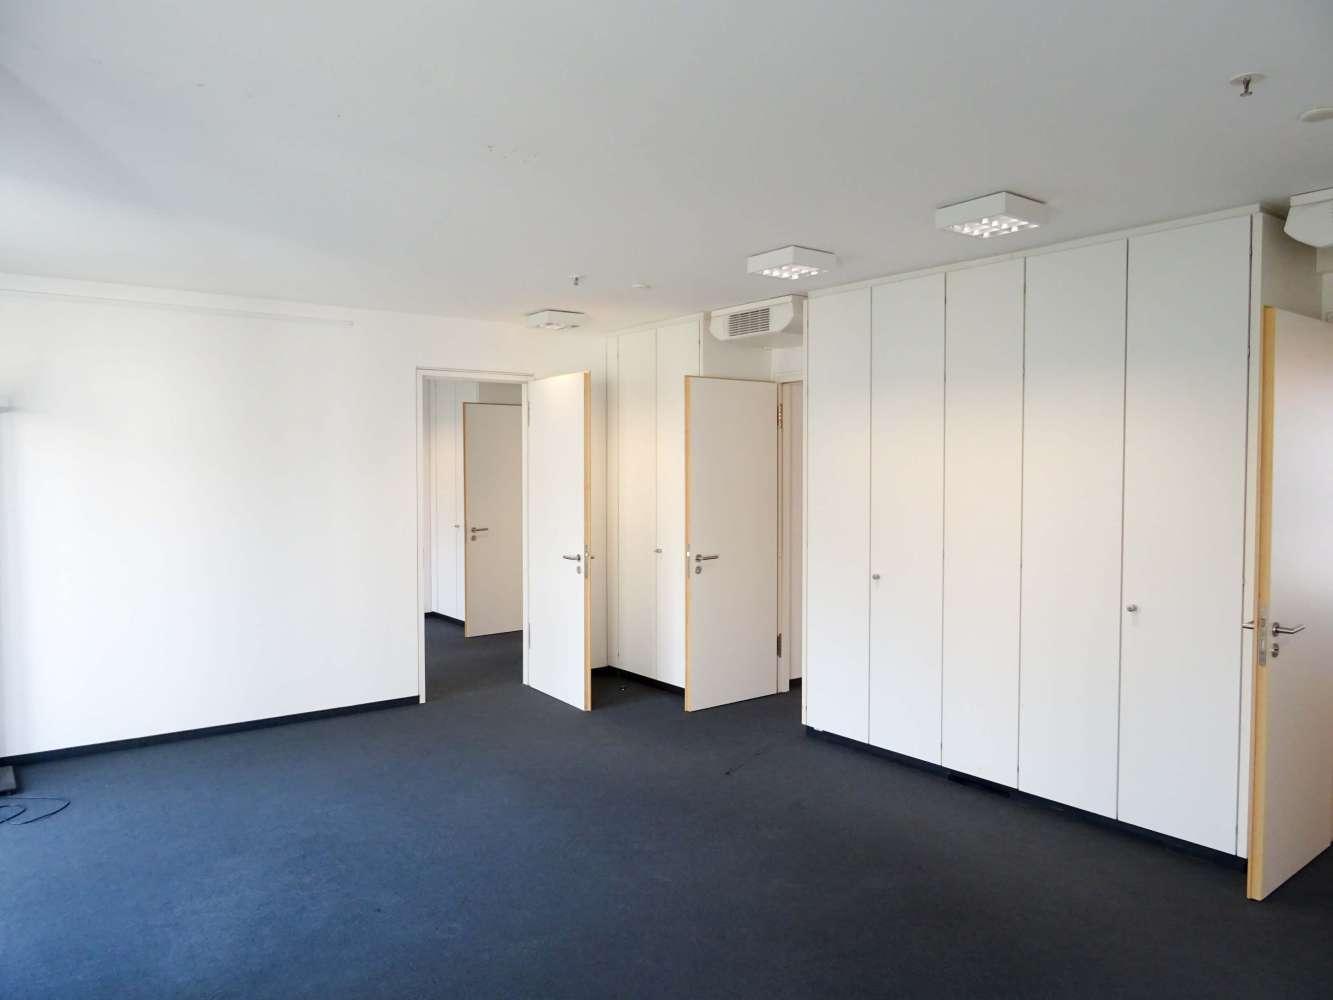 Büros Frankfurt am main, 60325 - Büro - Frankfurt am Main, Westend-Süd - F0148 - 10446358